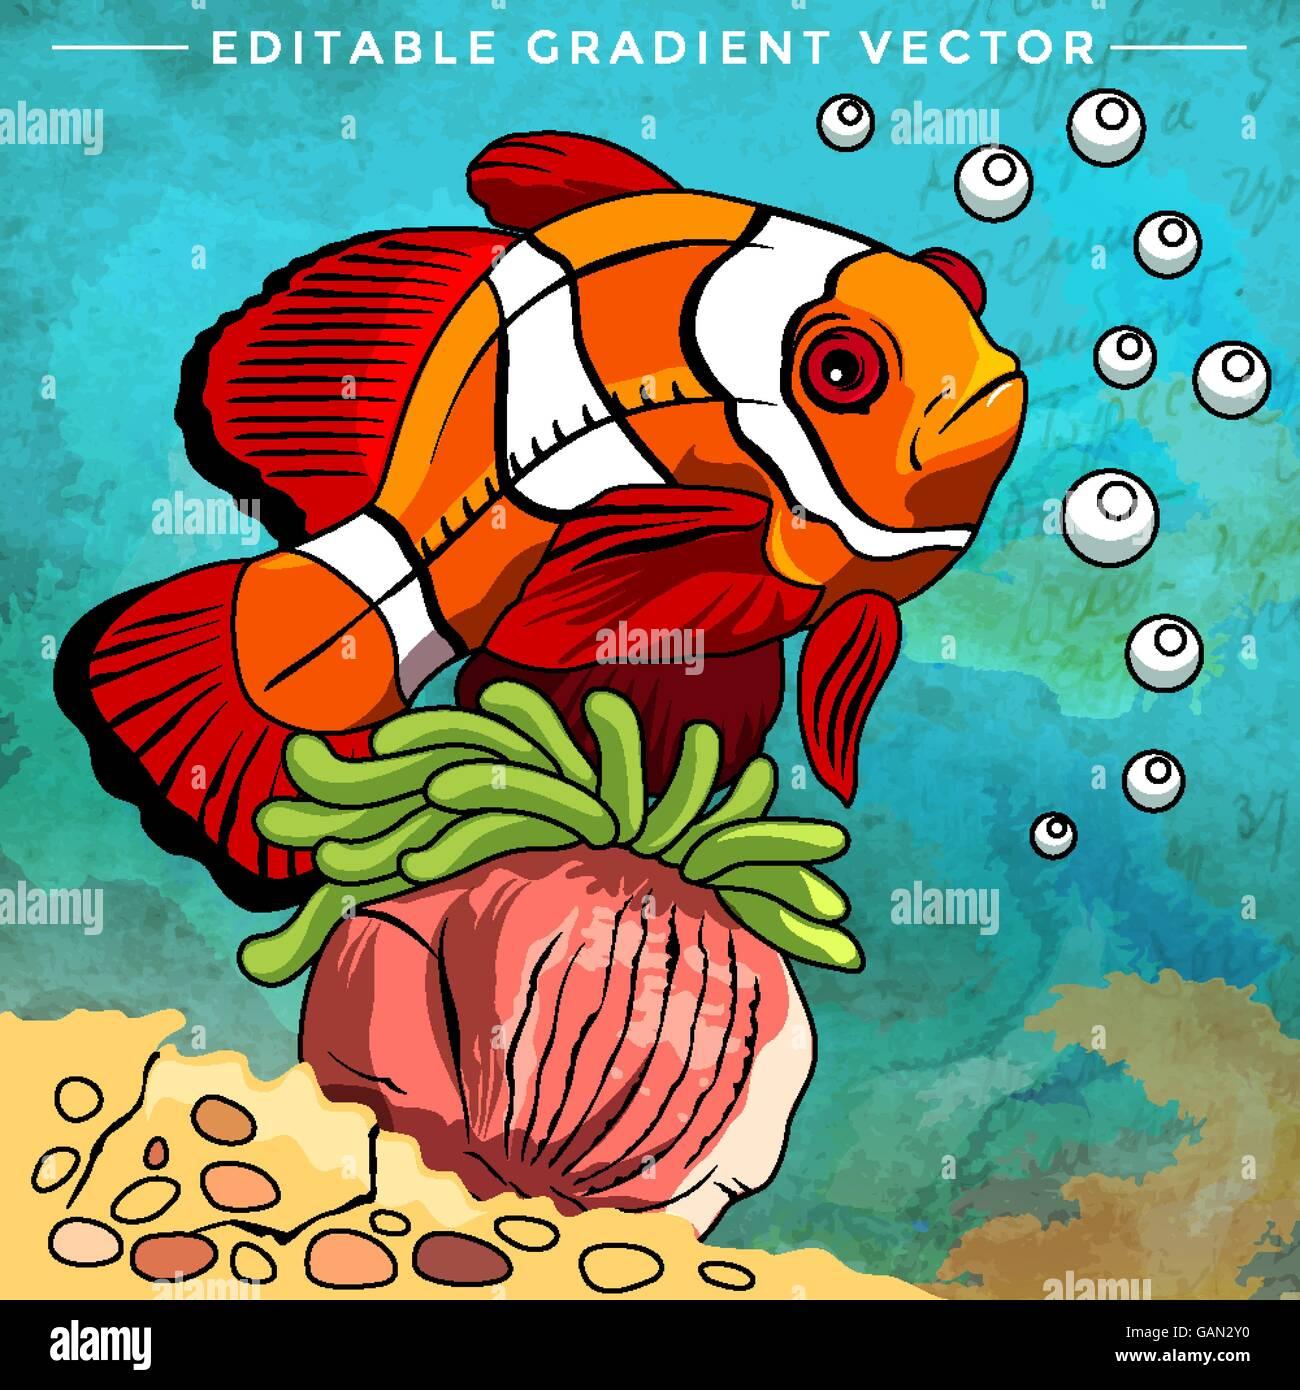 Angelfish Painting Stock Photos & Angelfish Painting Stock Images ...